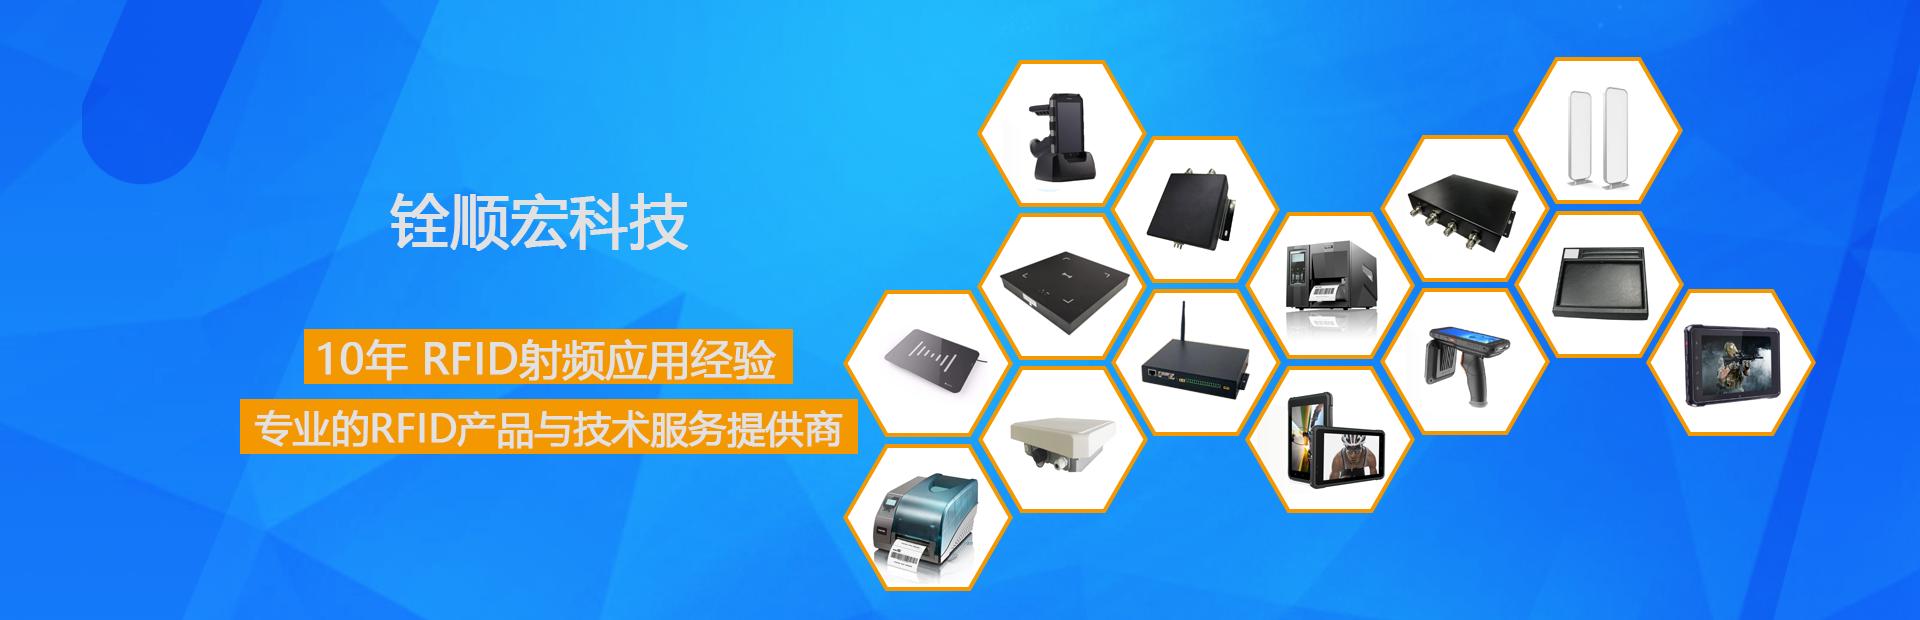 RFID读写器,rfid手持机,rfid打印机,门禁通道,深圳铨顺宏